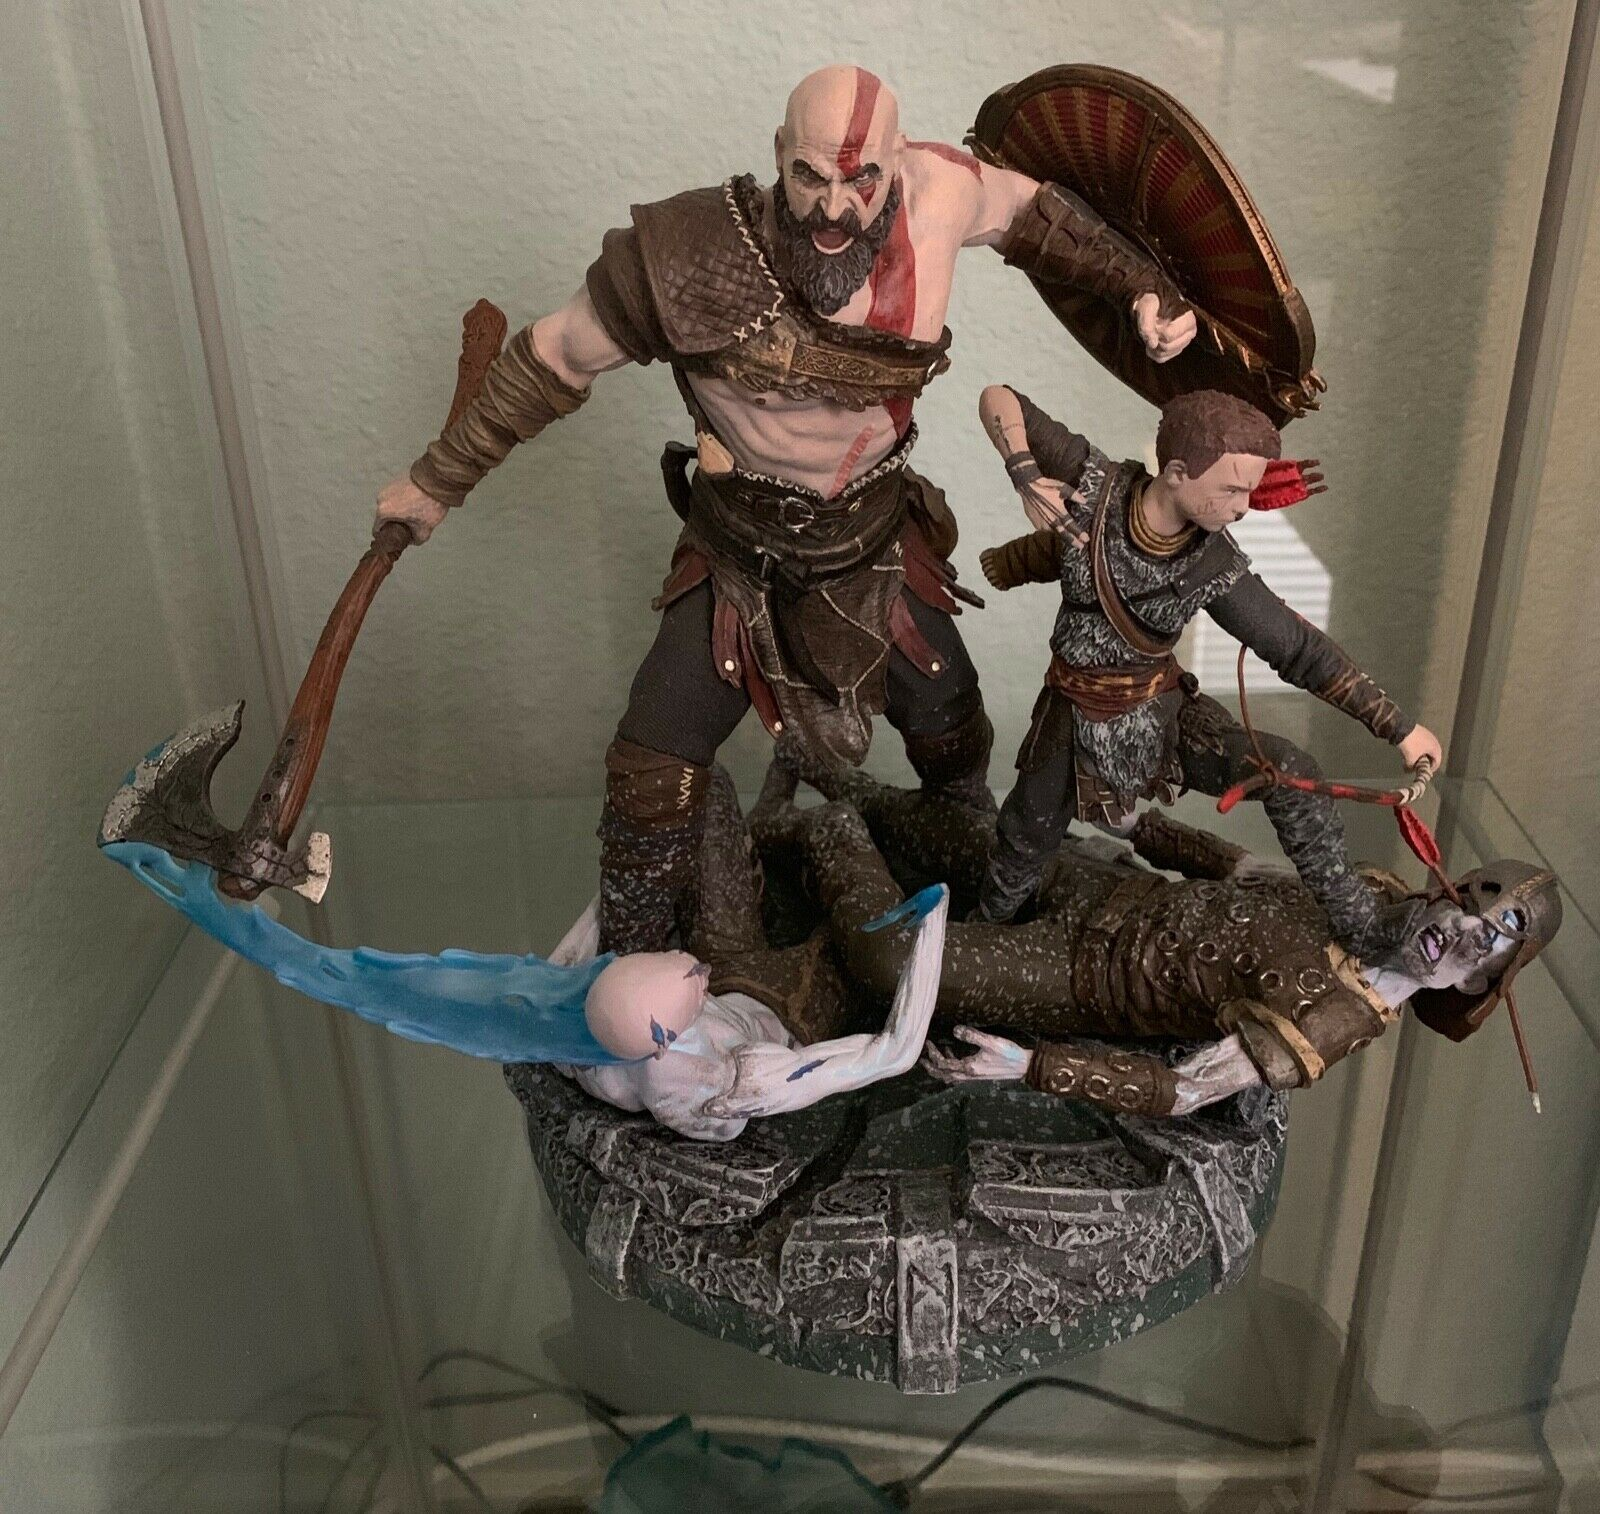 God of War Kratos & Atreus Statue Only Collectors edition